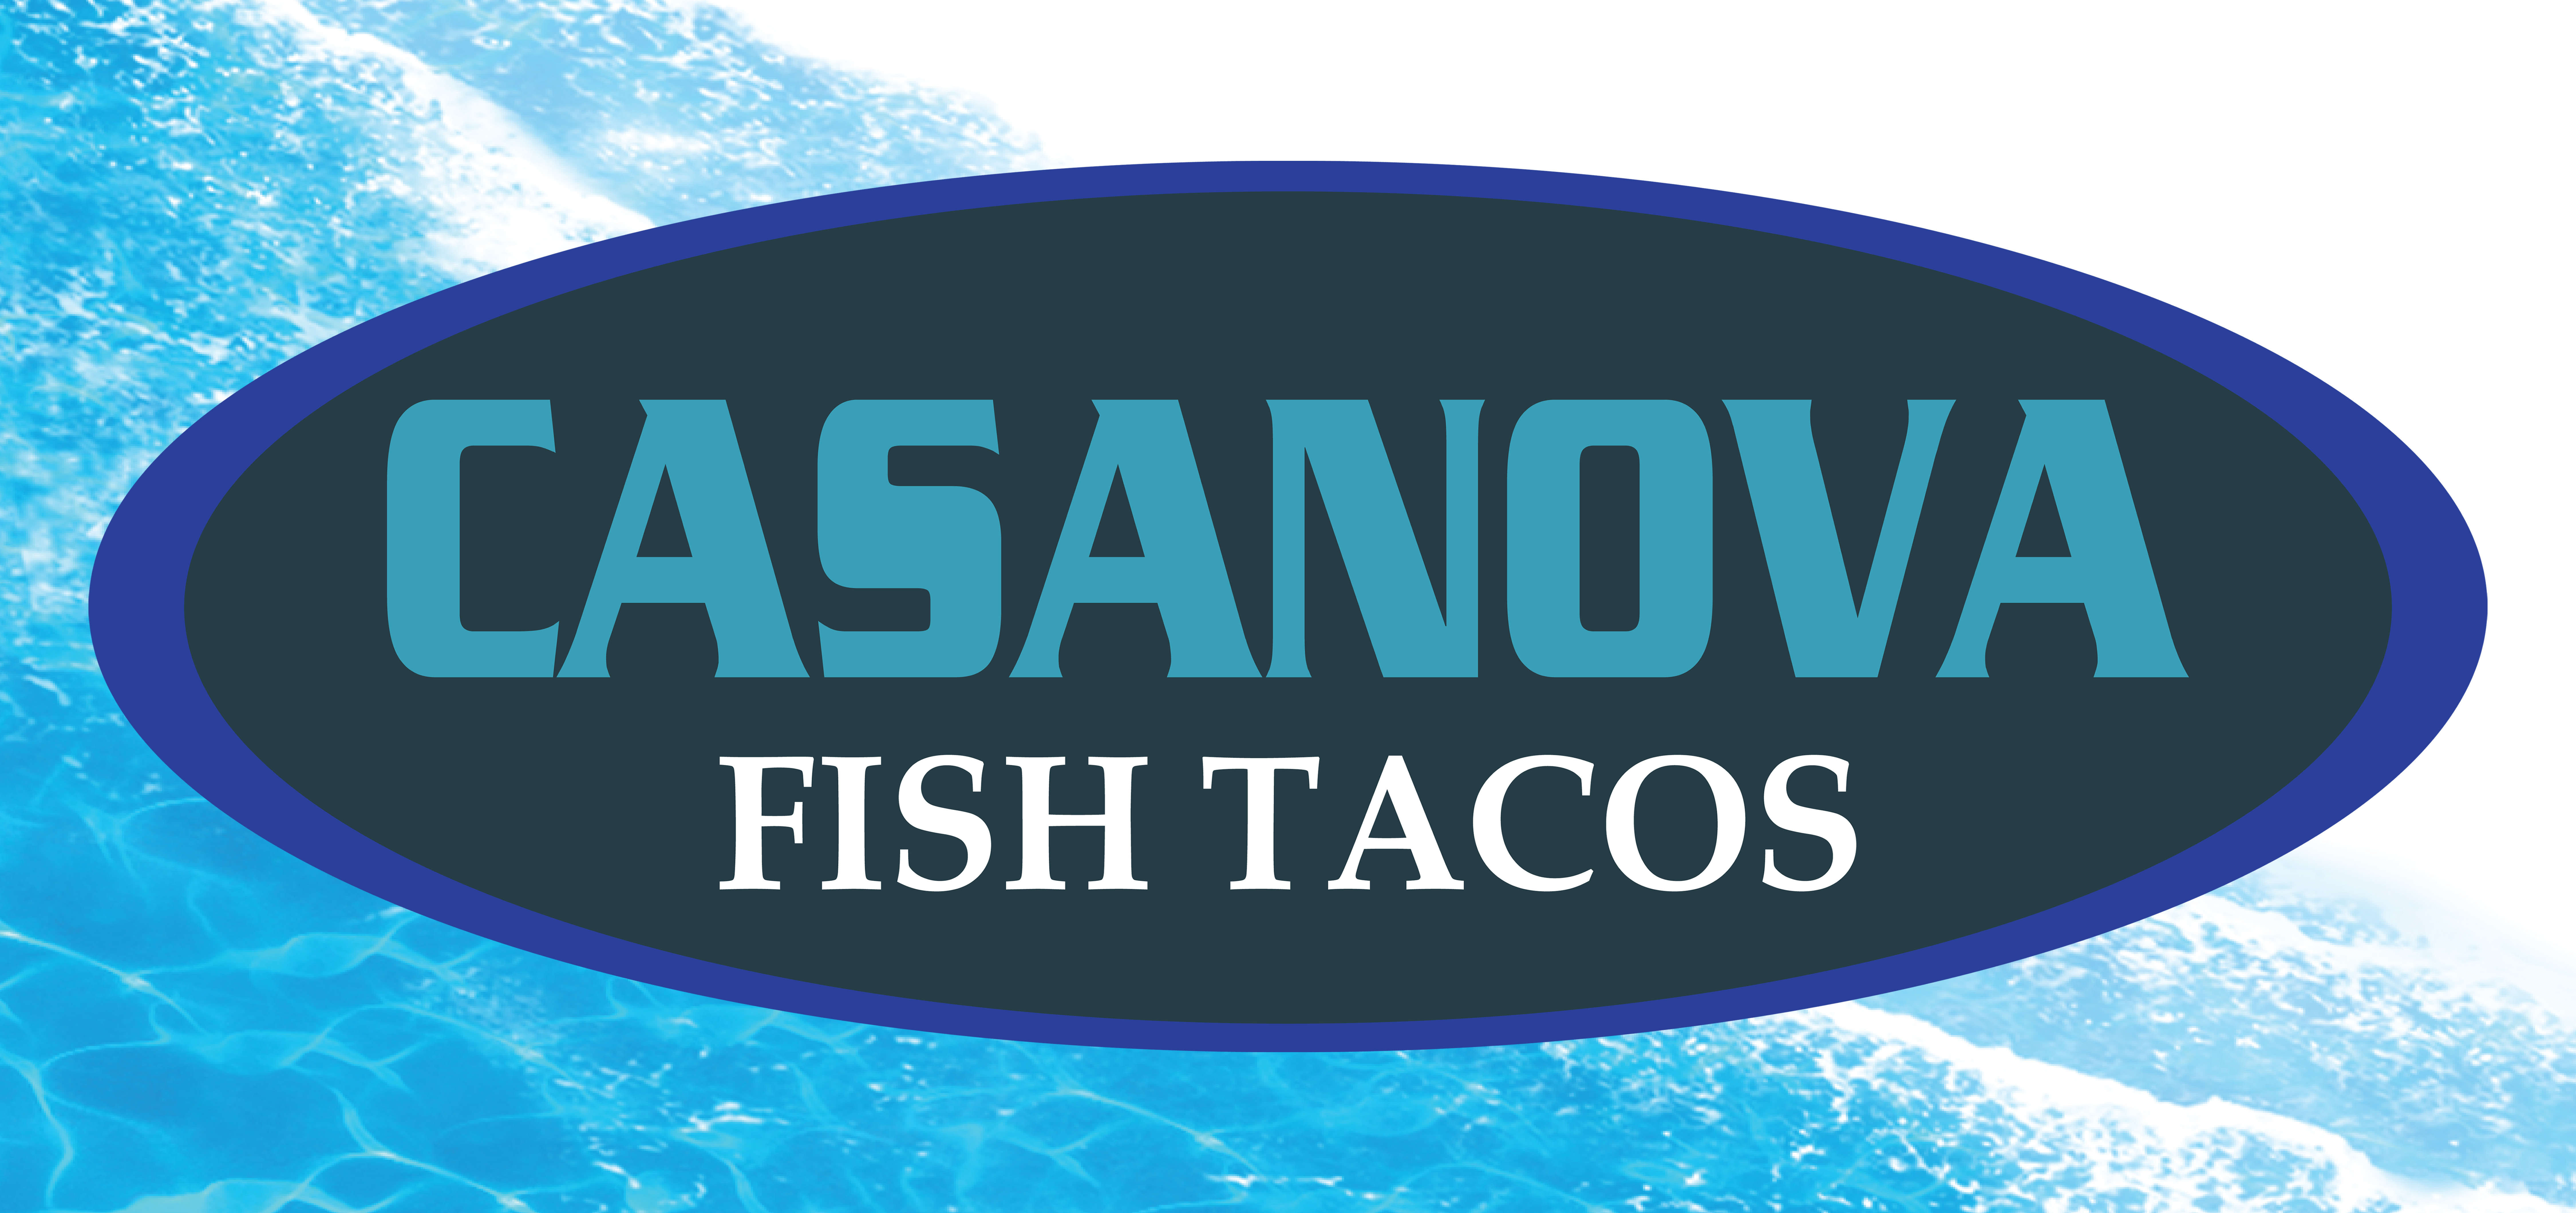 Casanova Fish Tacos